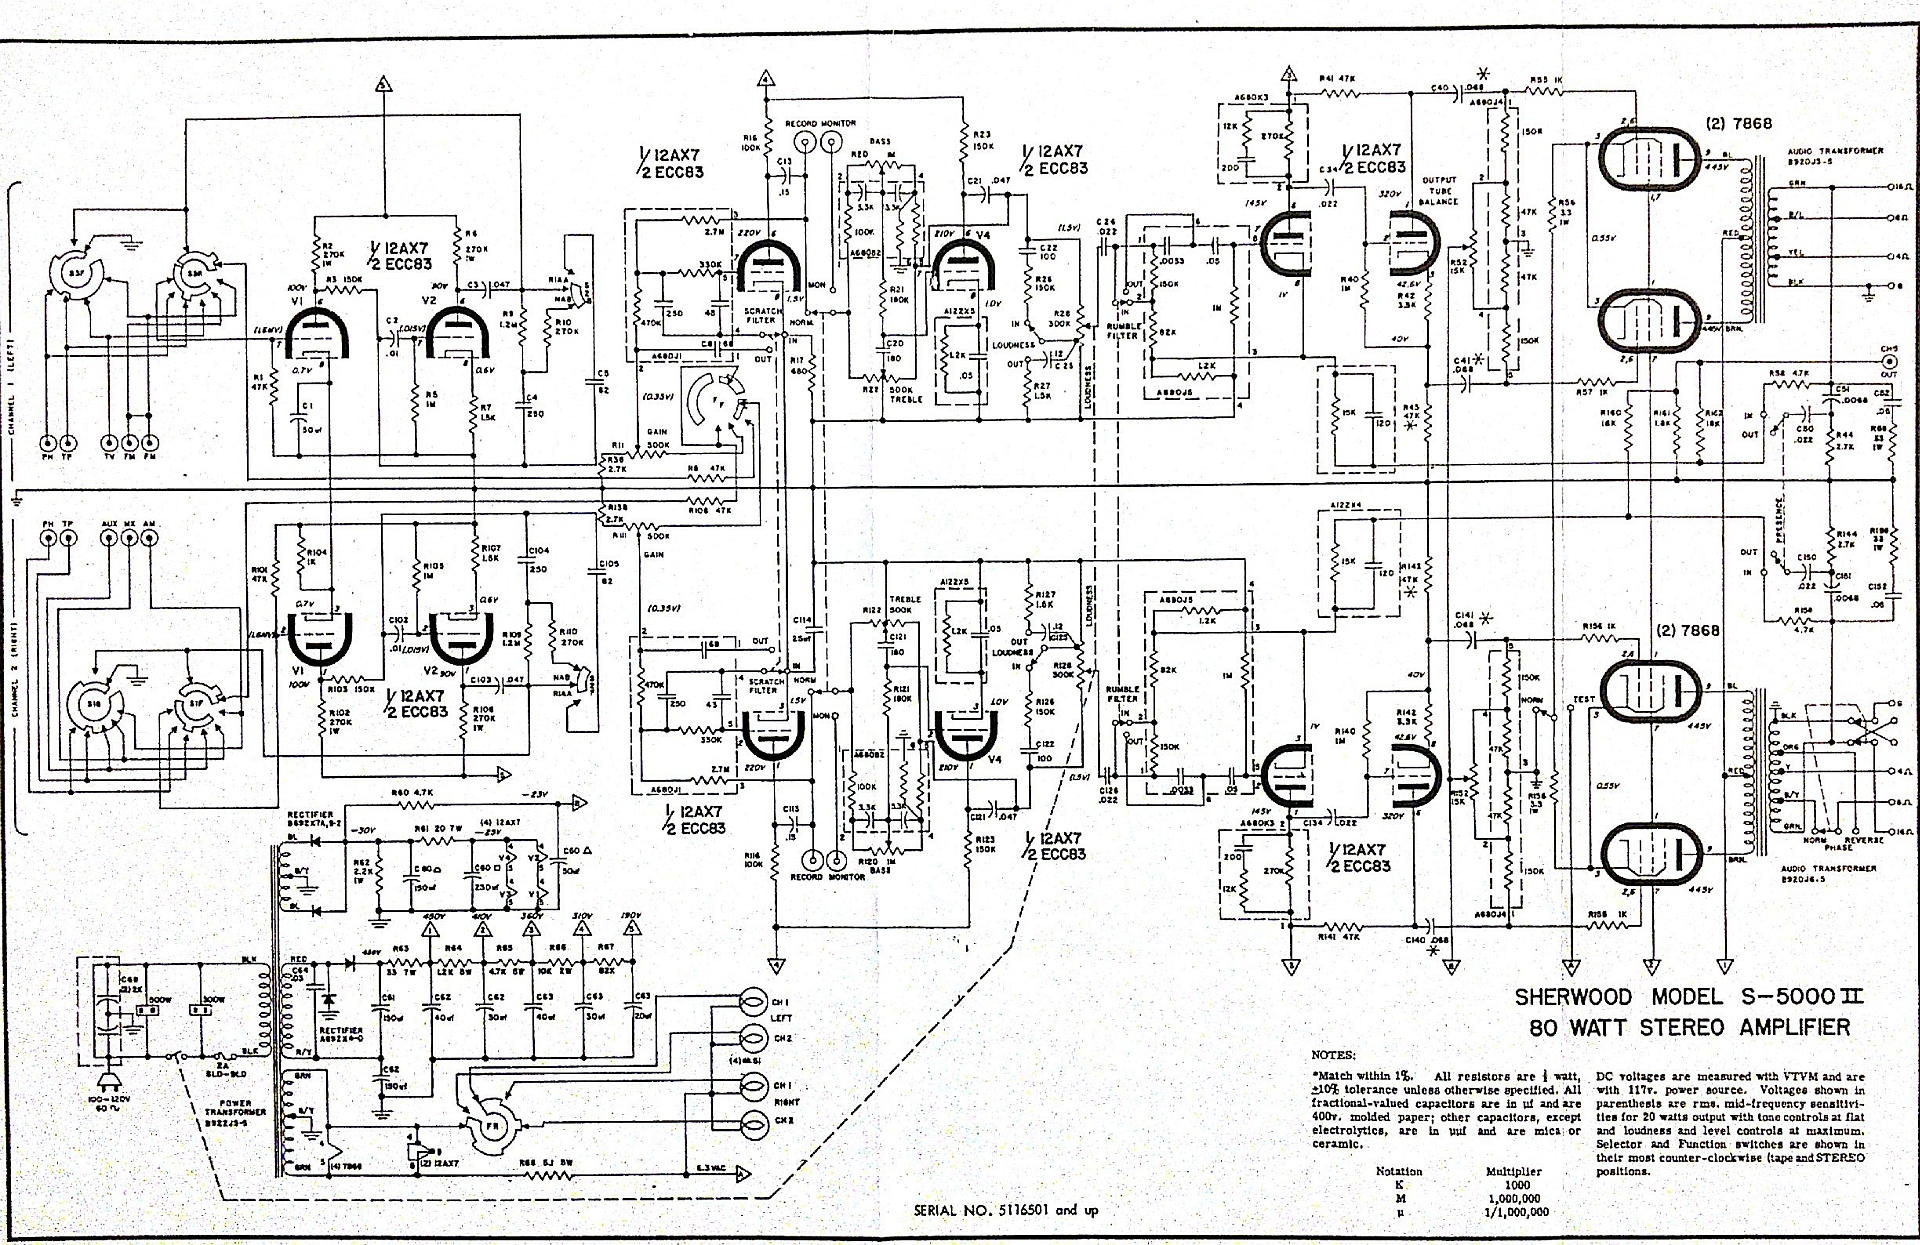 Sherwood S-5000 II schematic